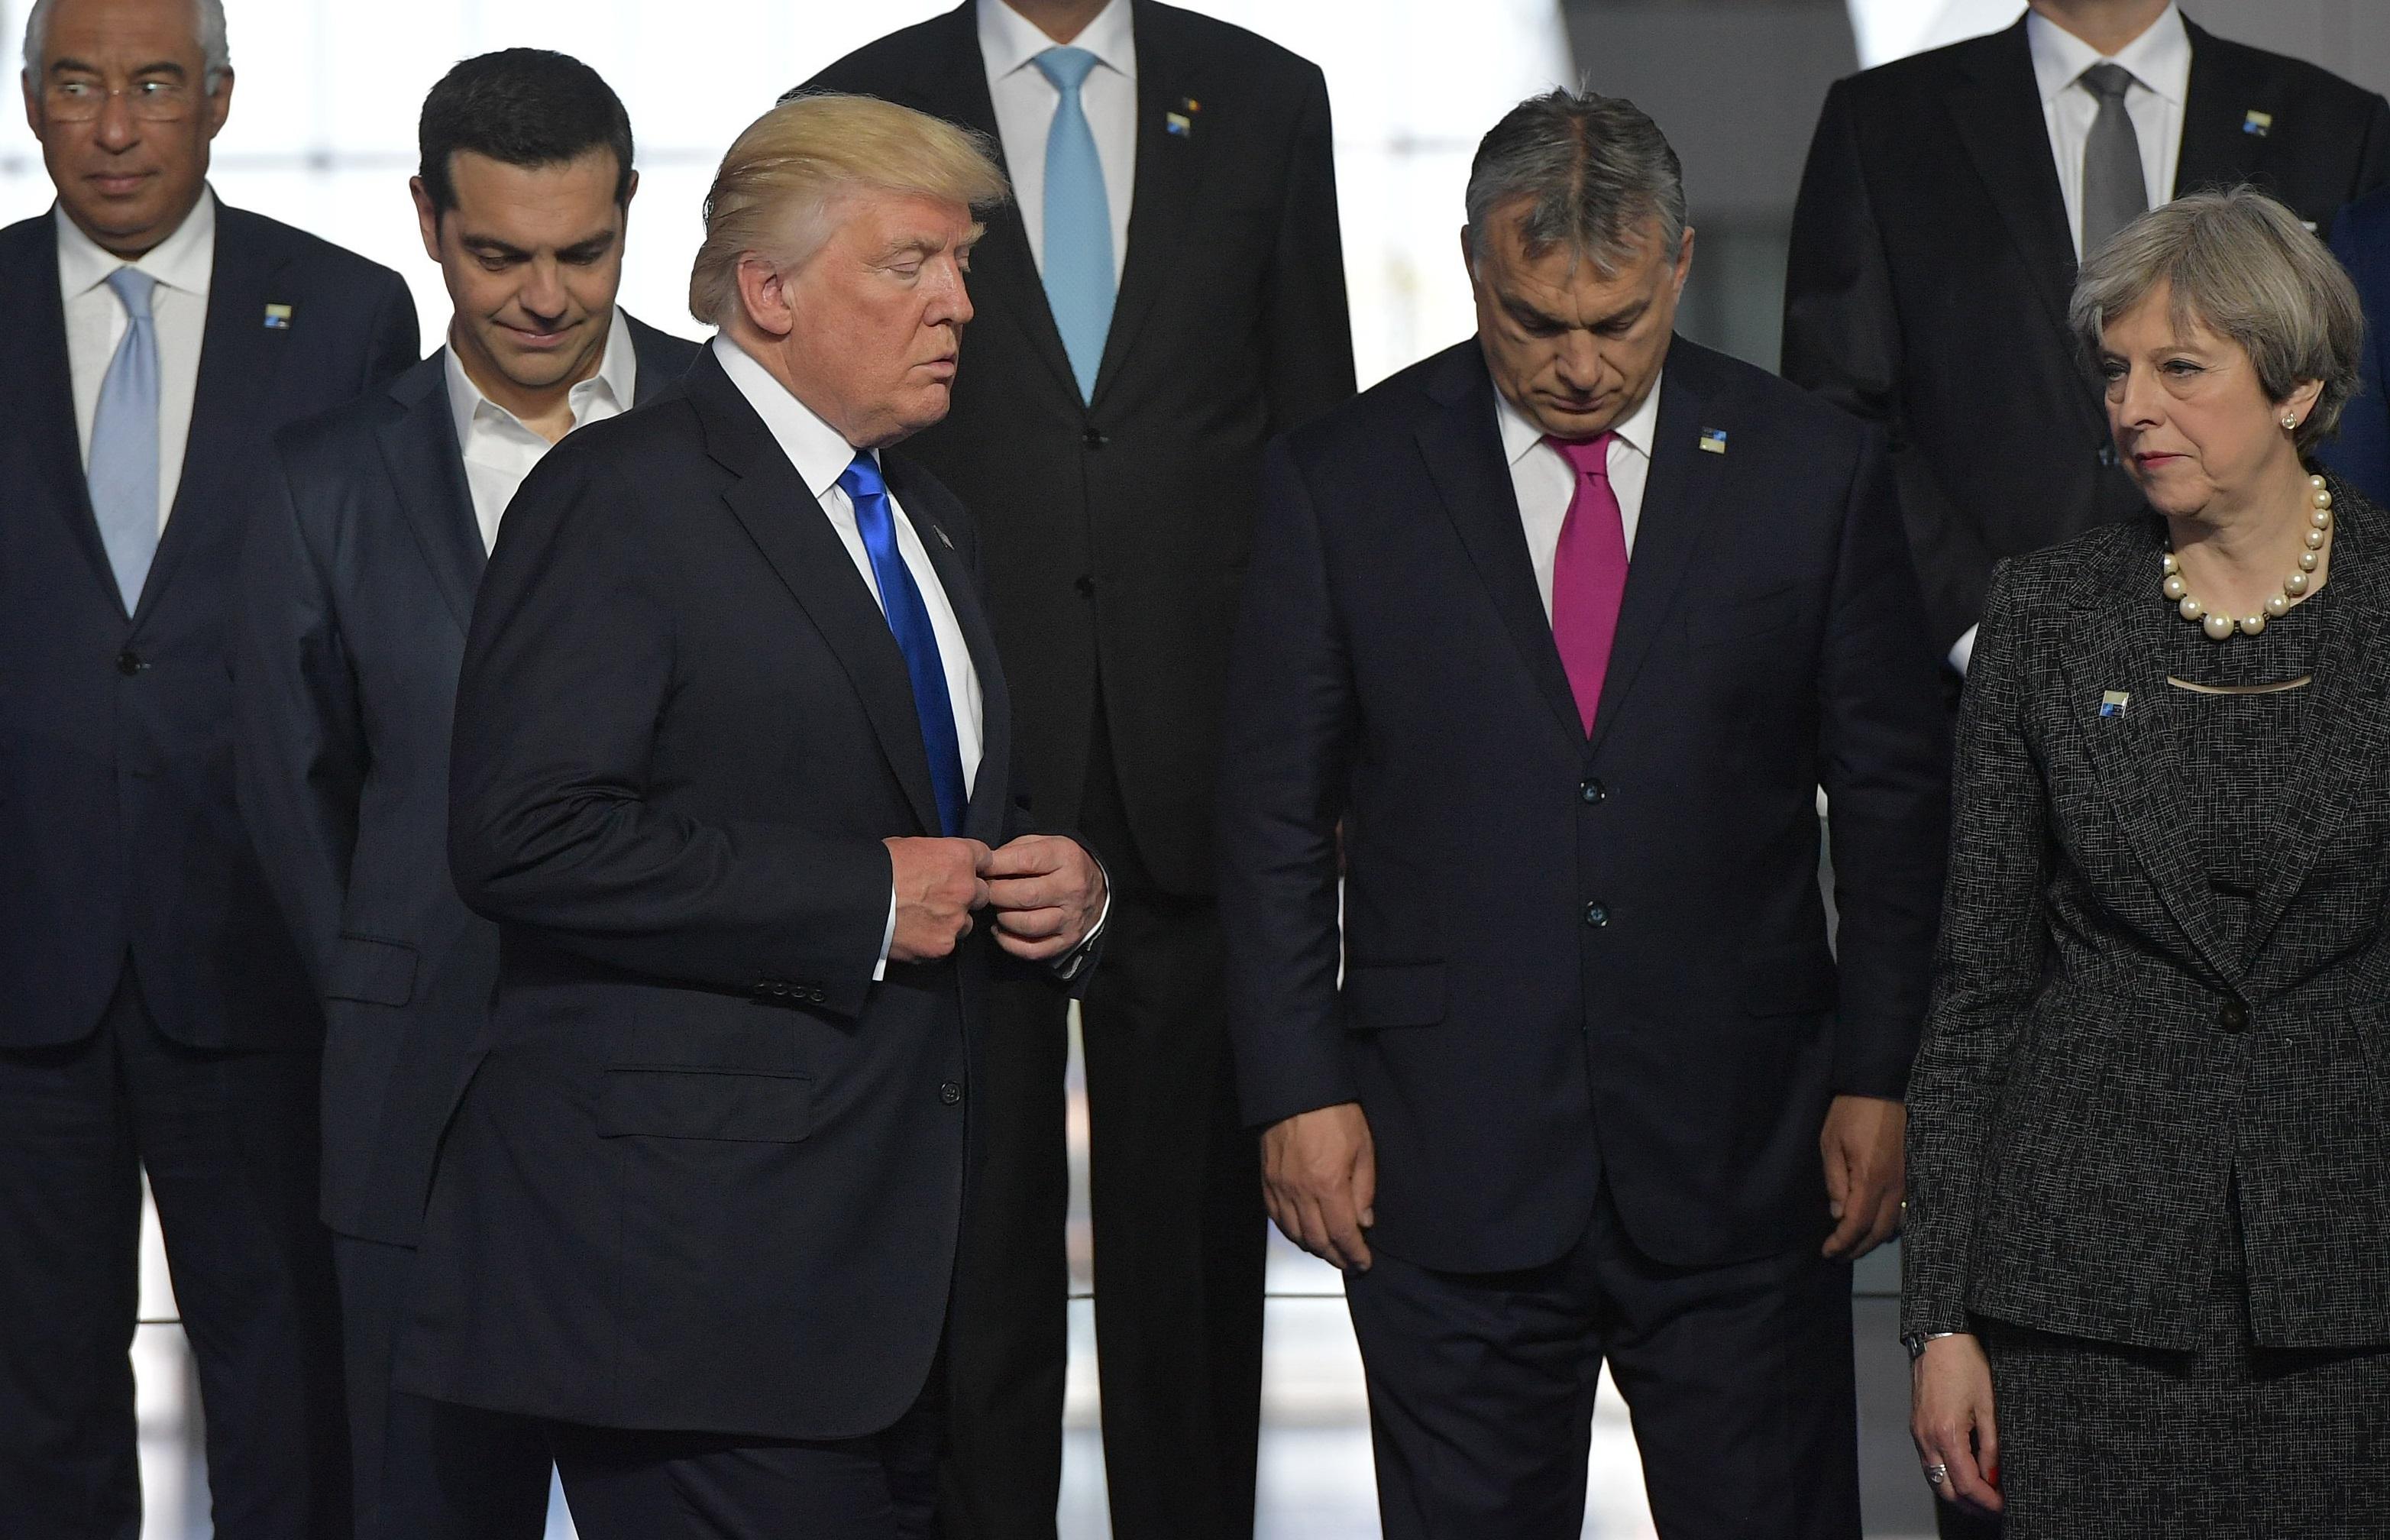 Donald Trump accueillera Viktor Orban à la Maison Blanche